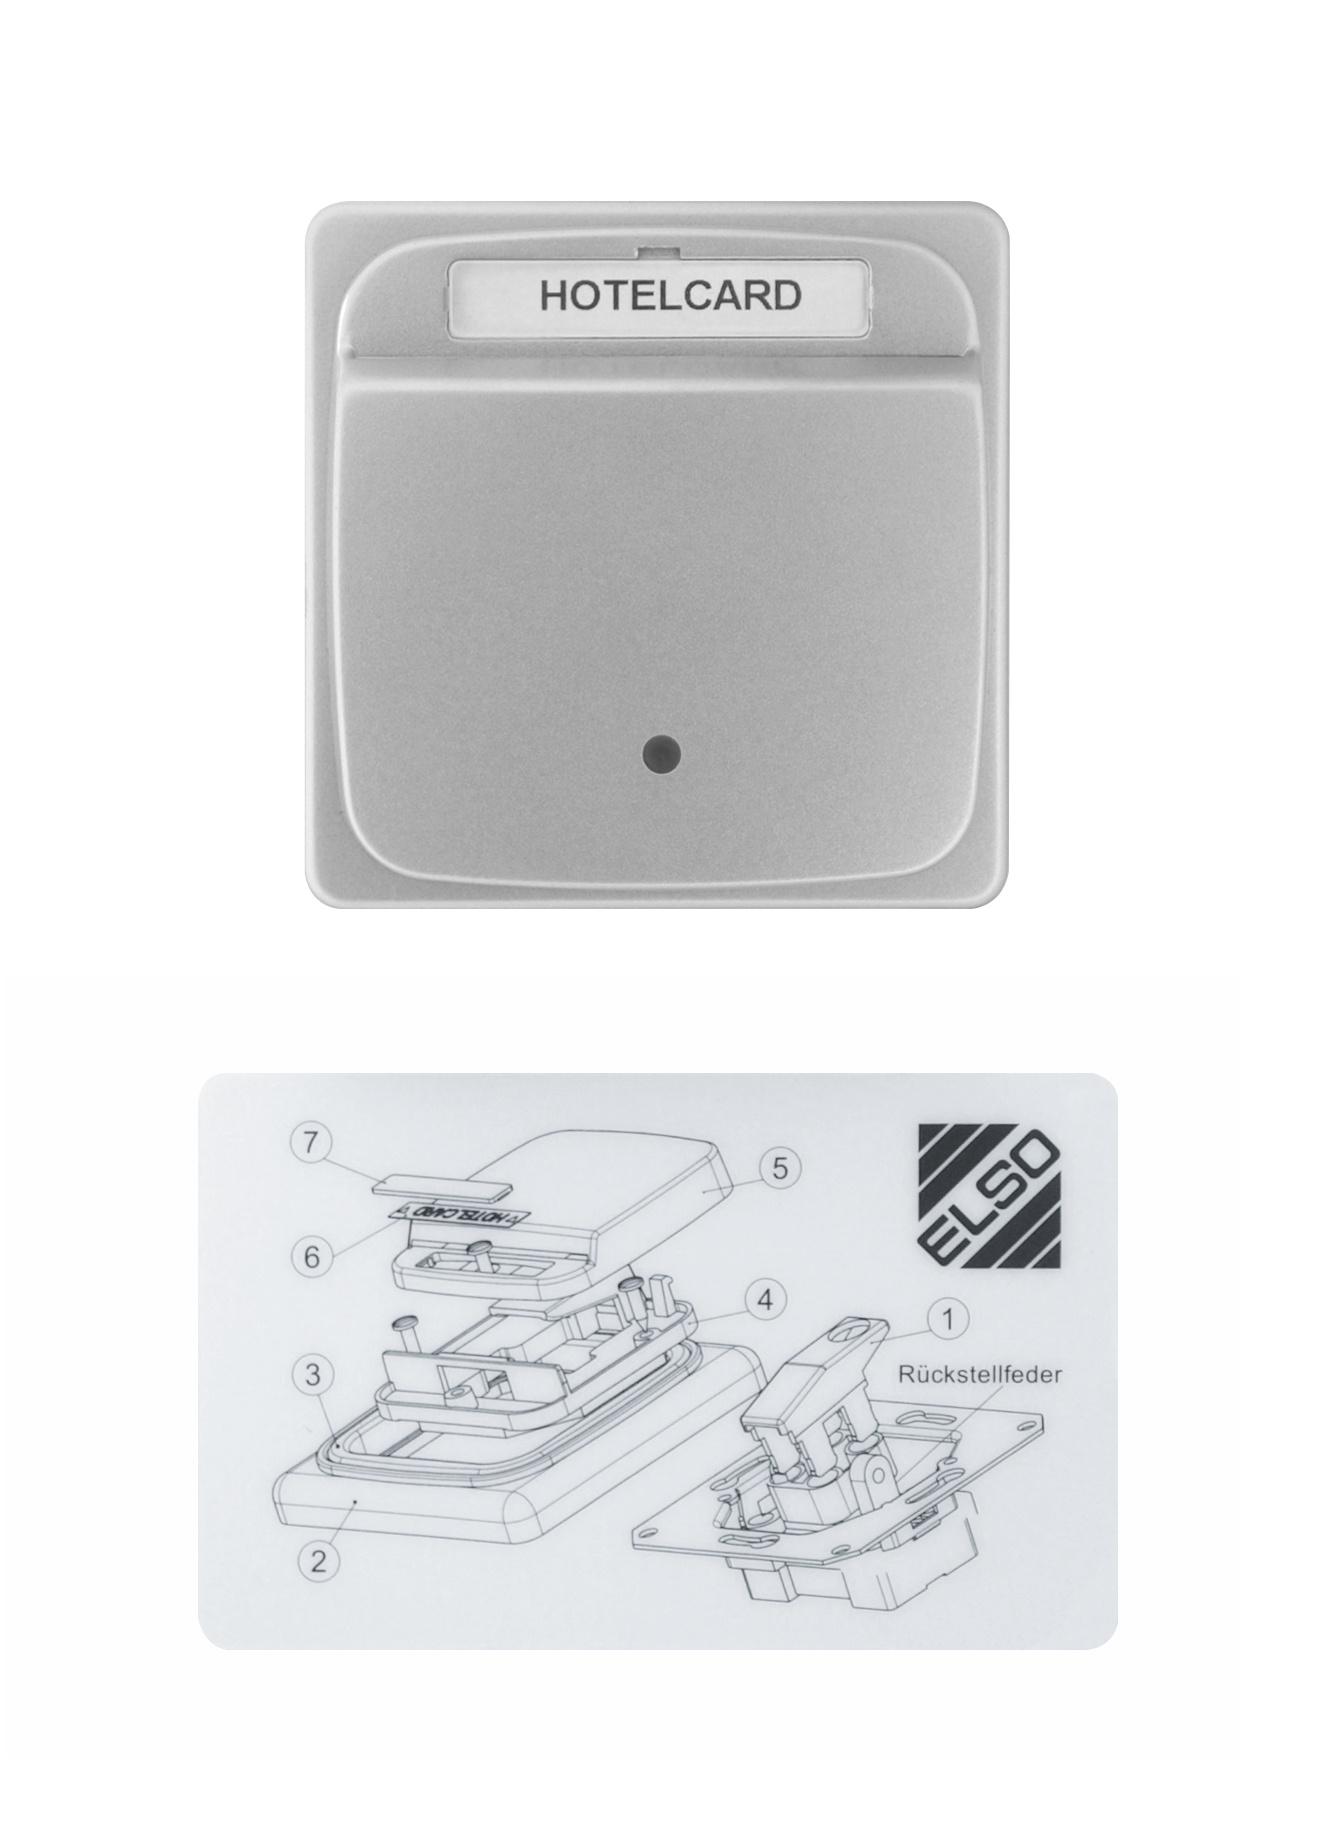 1 Stk Hotel-Card-Schalter, Alueffekt EL2030519-